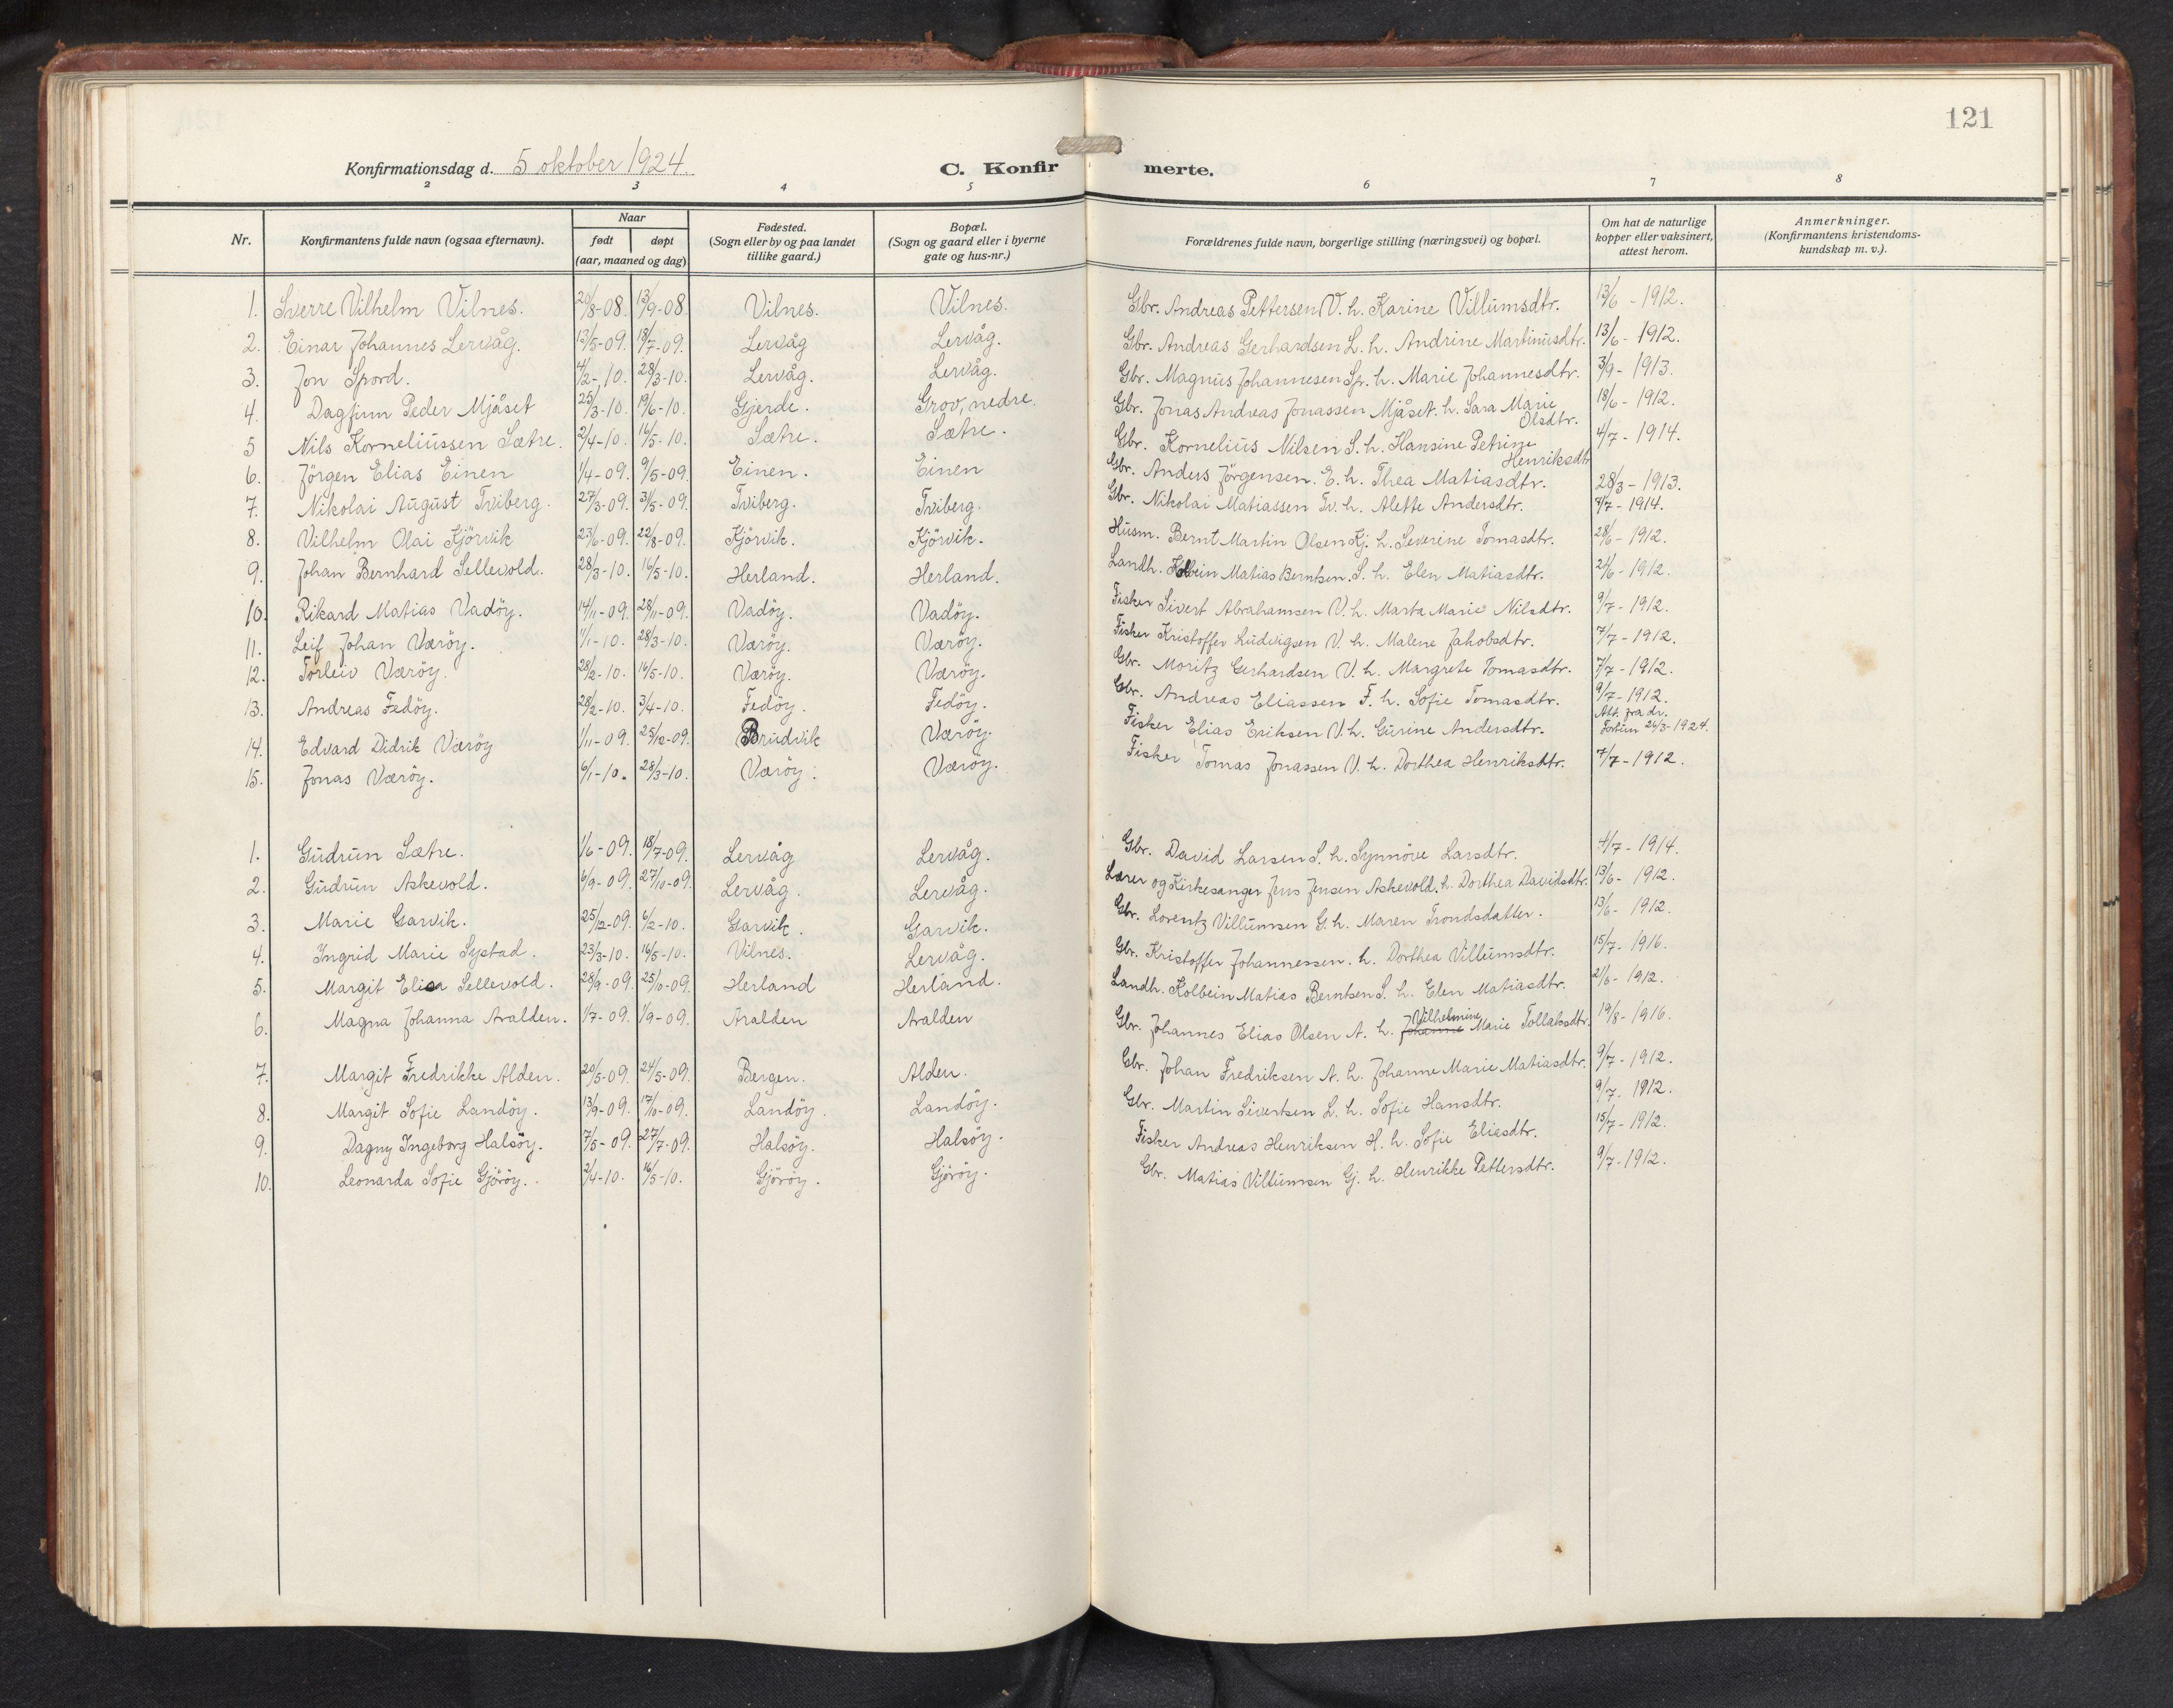 SAB, Askvoll sokneprestembete, H/Hab/Habb/L0002: Klokkerbok nr. B 2, 1910-1947, s. 120b-121a